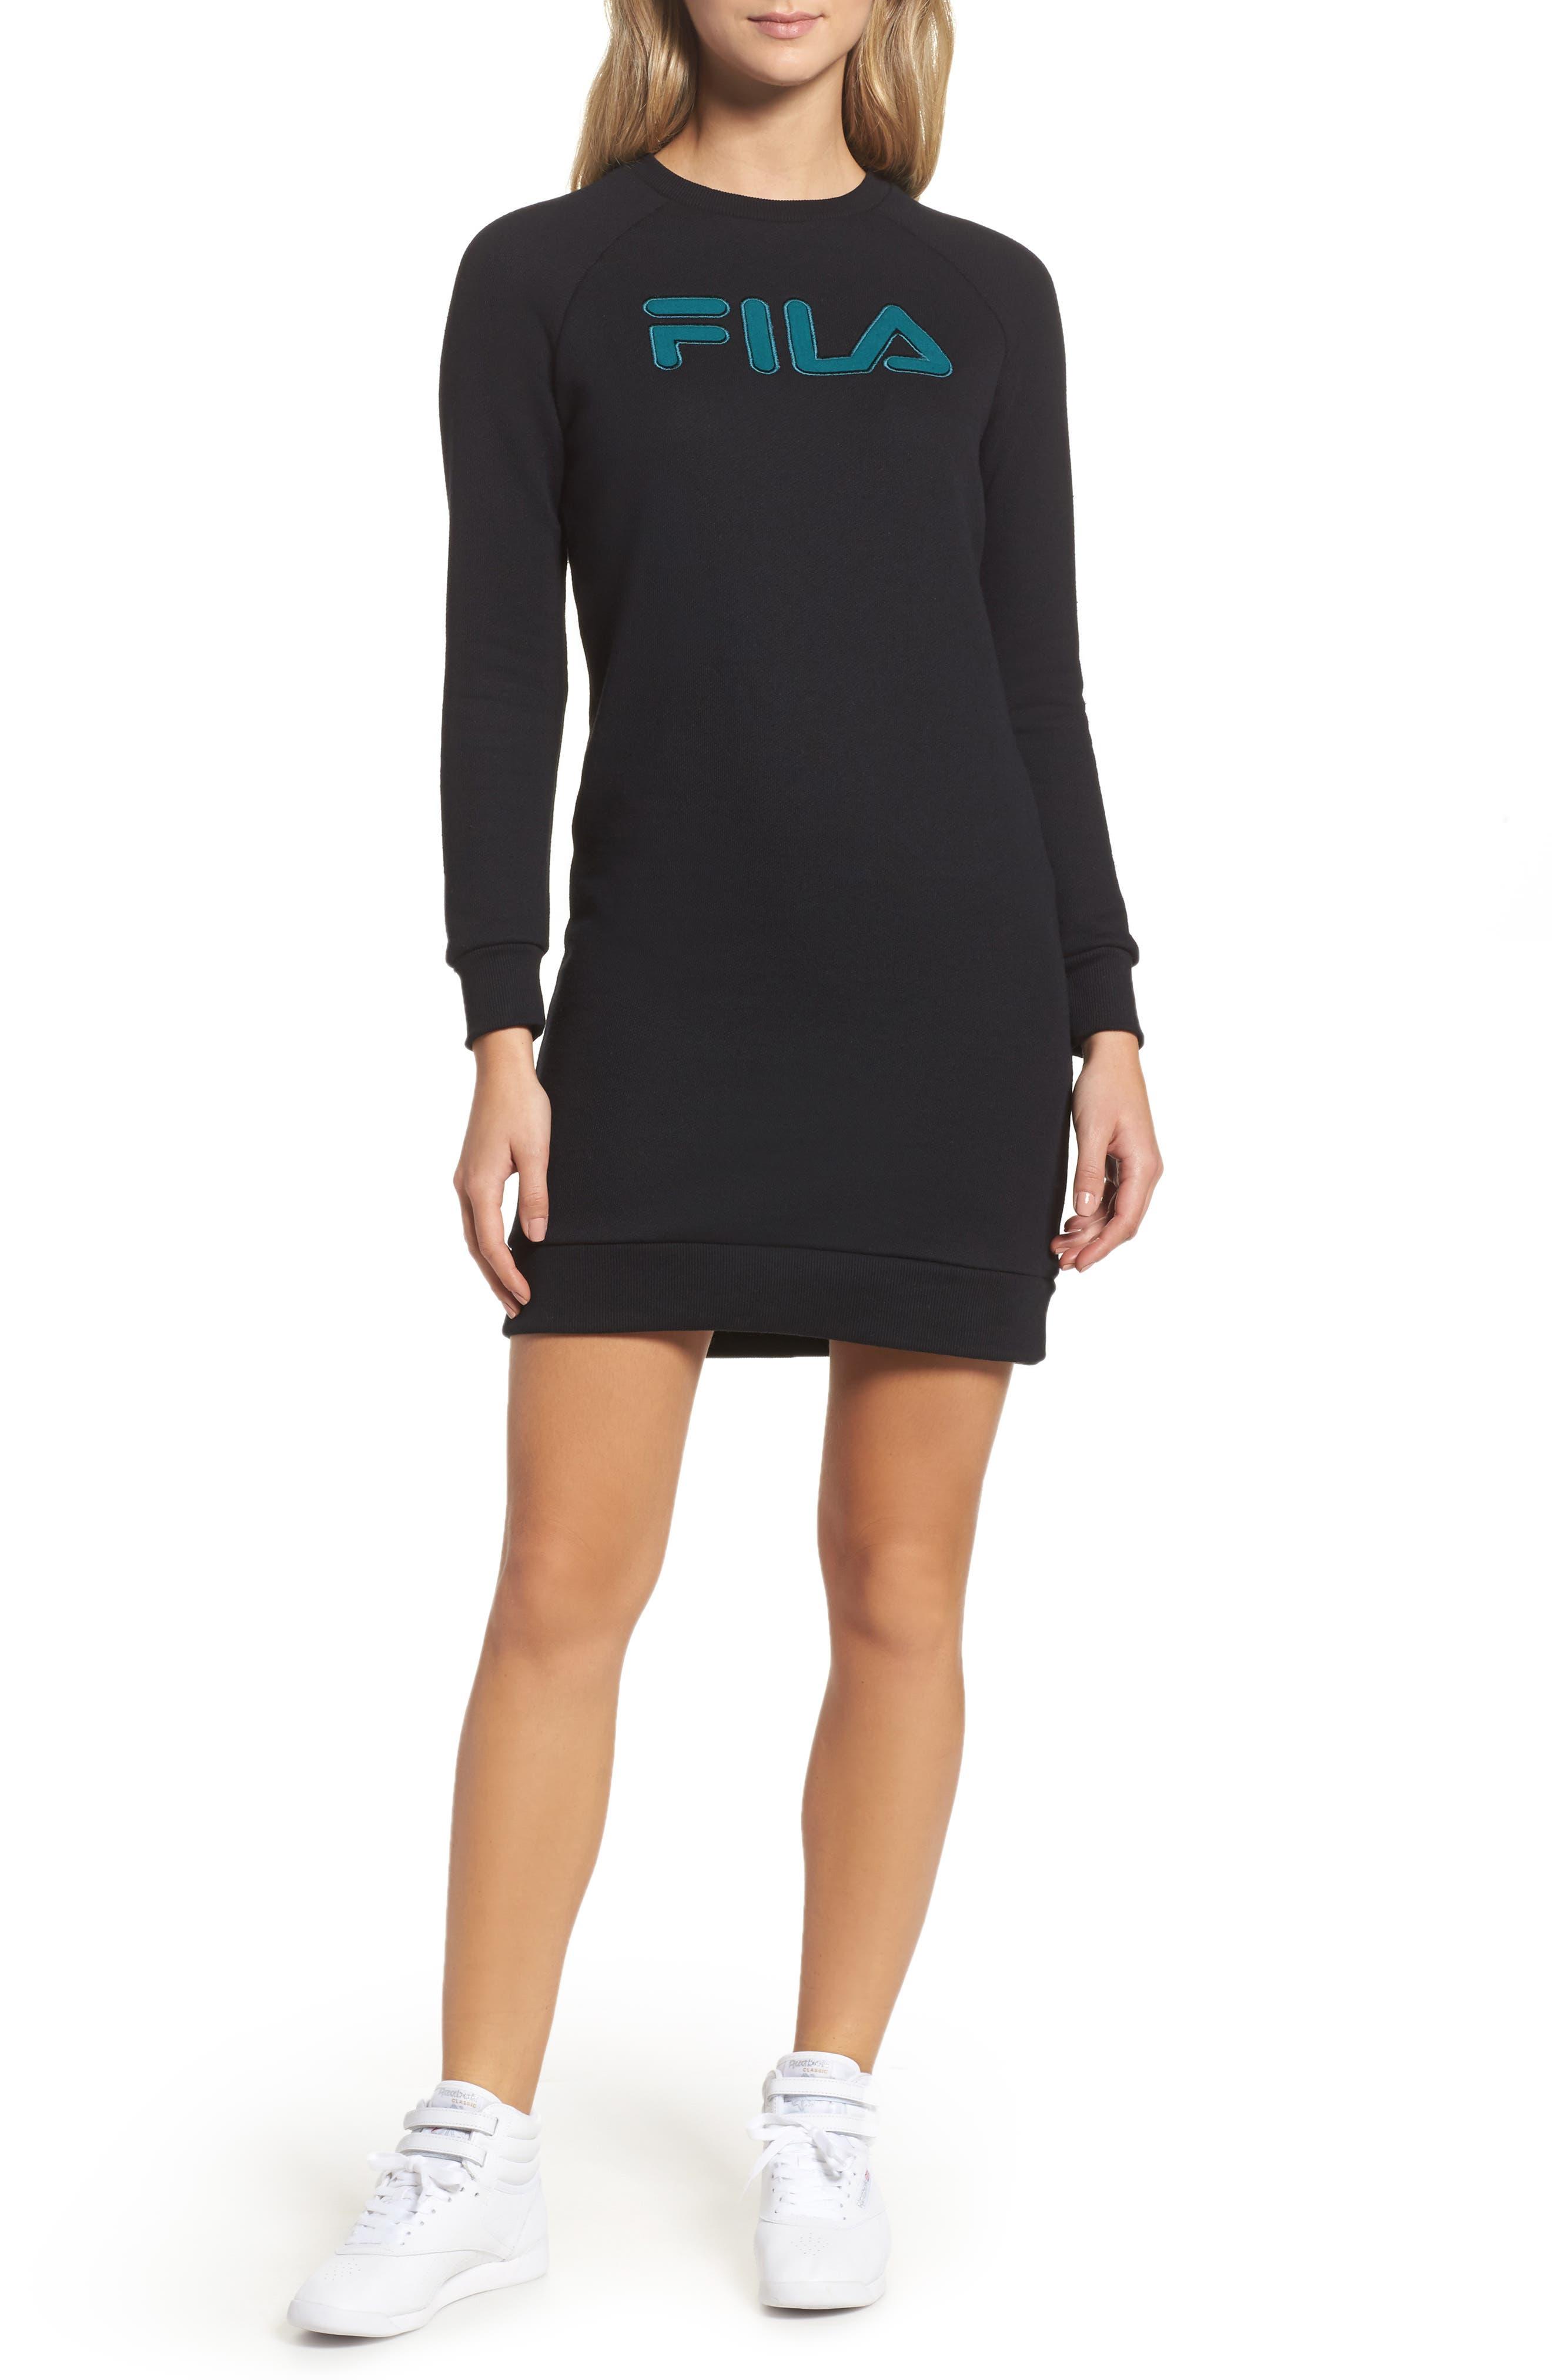 Main Image - FILA Courtney Sweatshirt Dress